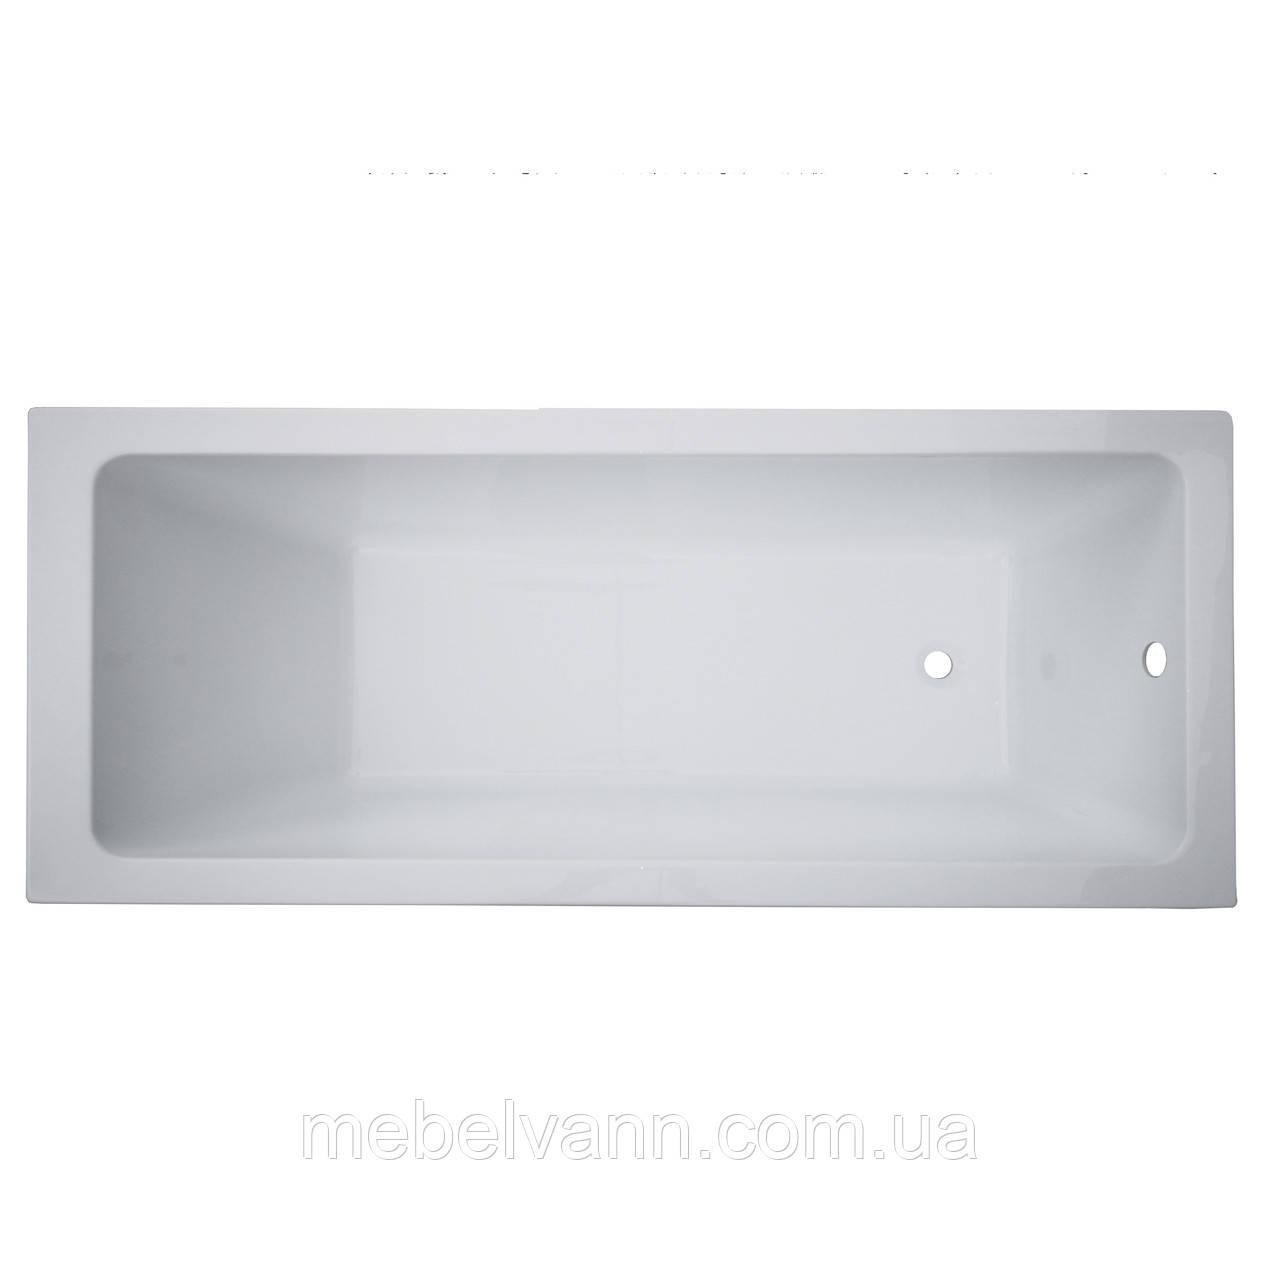 Libra Ванна 150*70 акриловая Volle TS-1570458